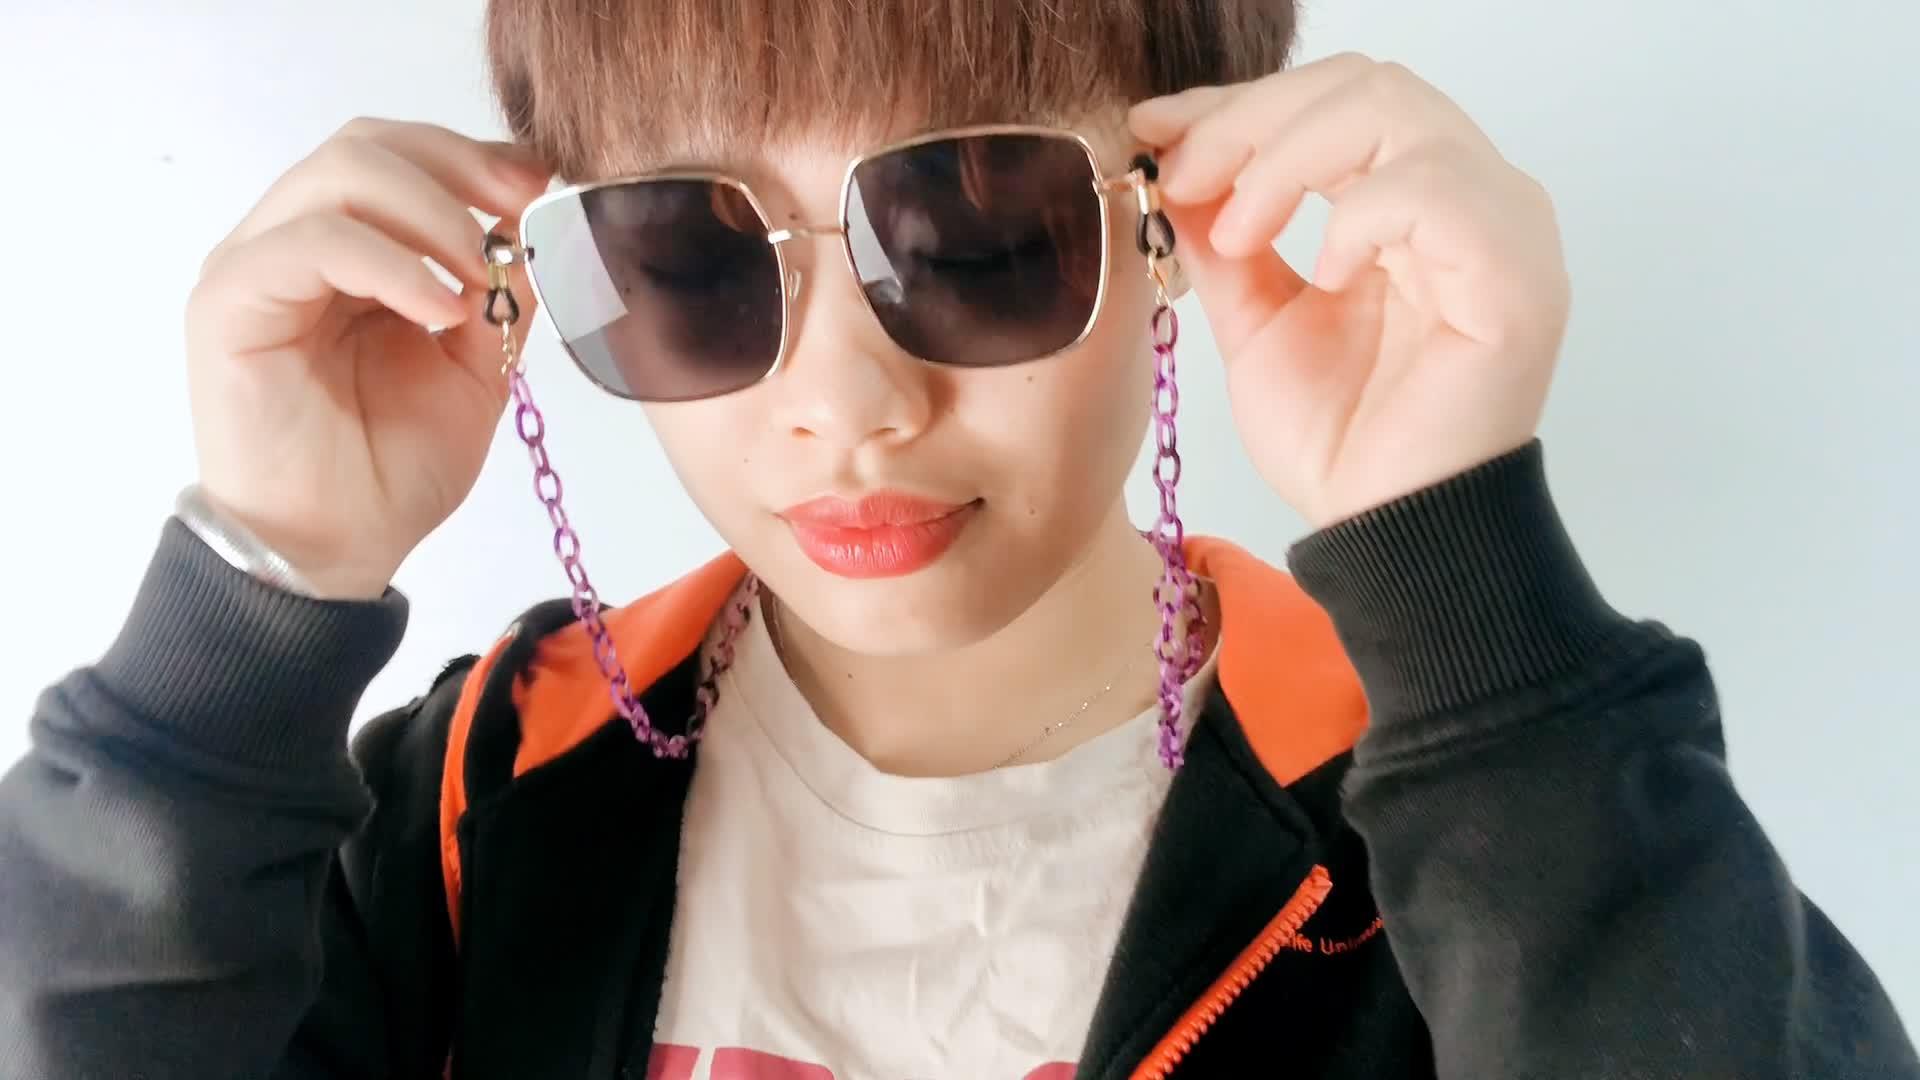 Glasses Custom Cord Acrylic Chain Necklace Acetate Sunglasses